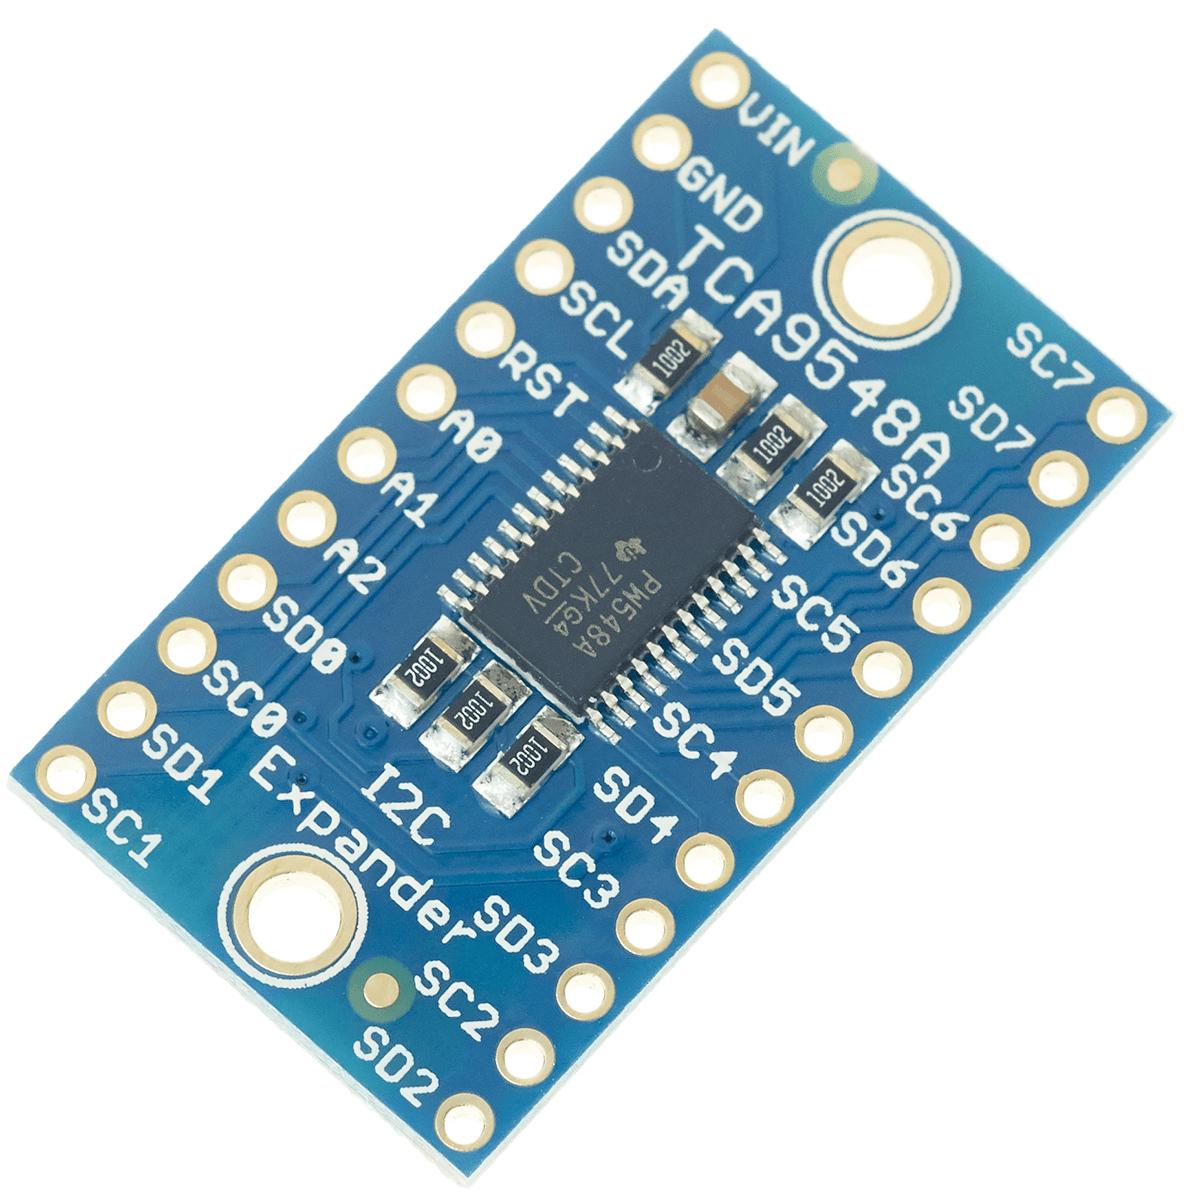 Details about Adafruit TCA9548A I2C Multiplexer